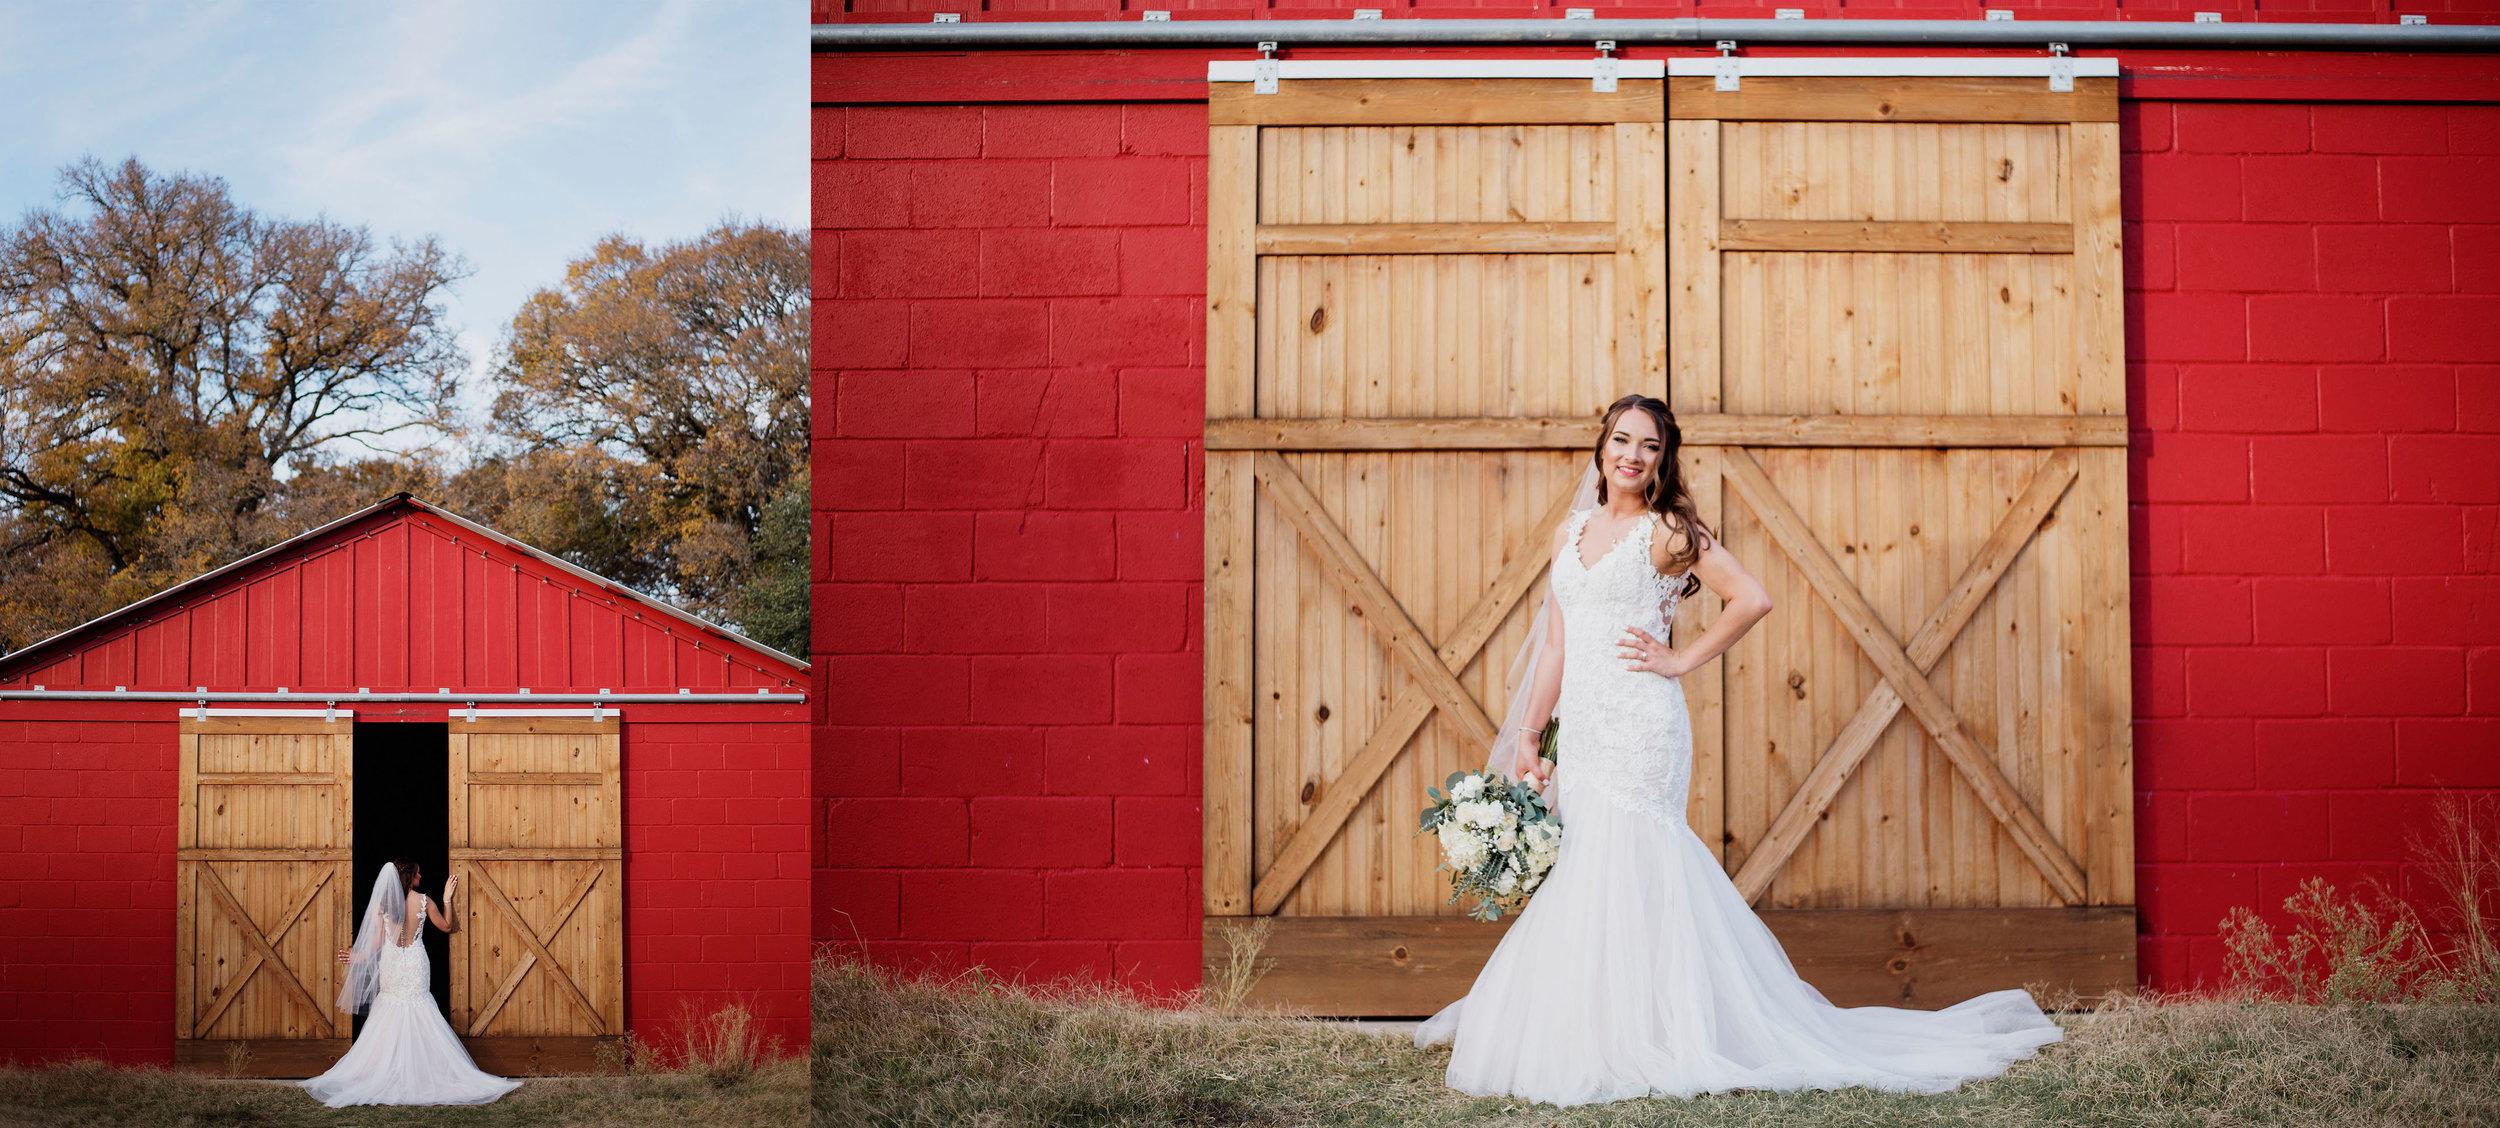 EffJay Photography Destination Wedding Photographer Austin TX Bridal Session La Estancia Bella010.jpg